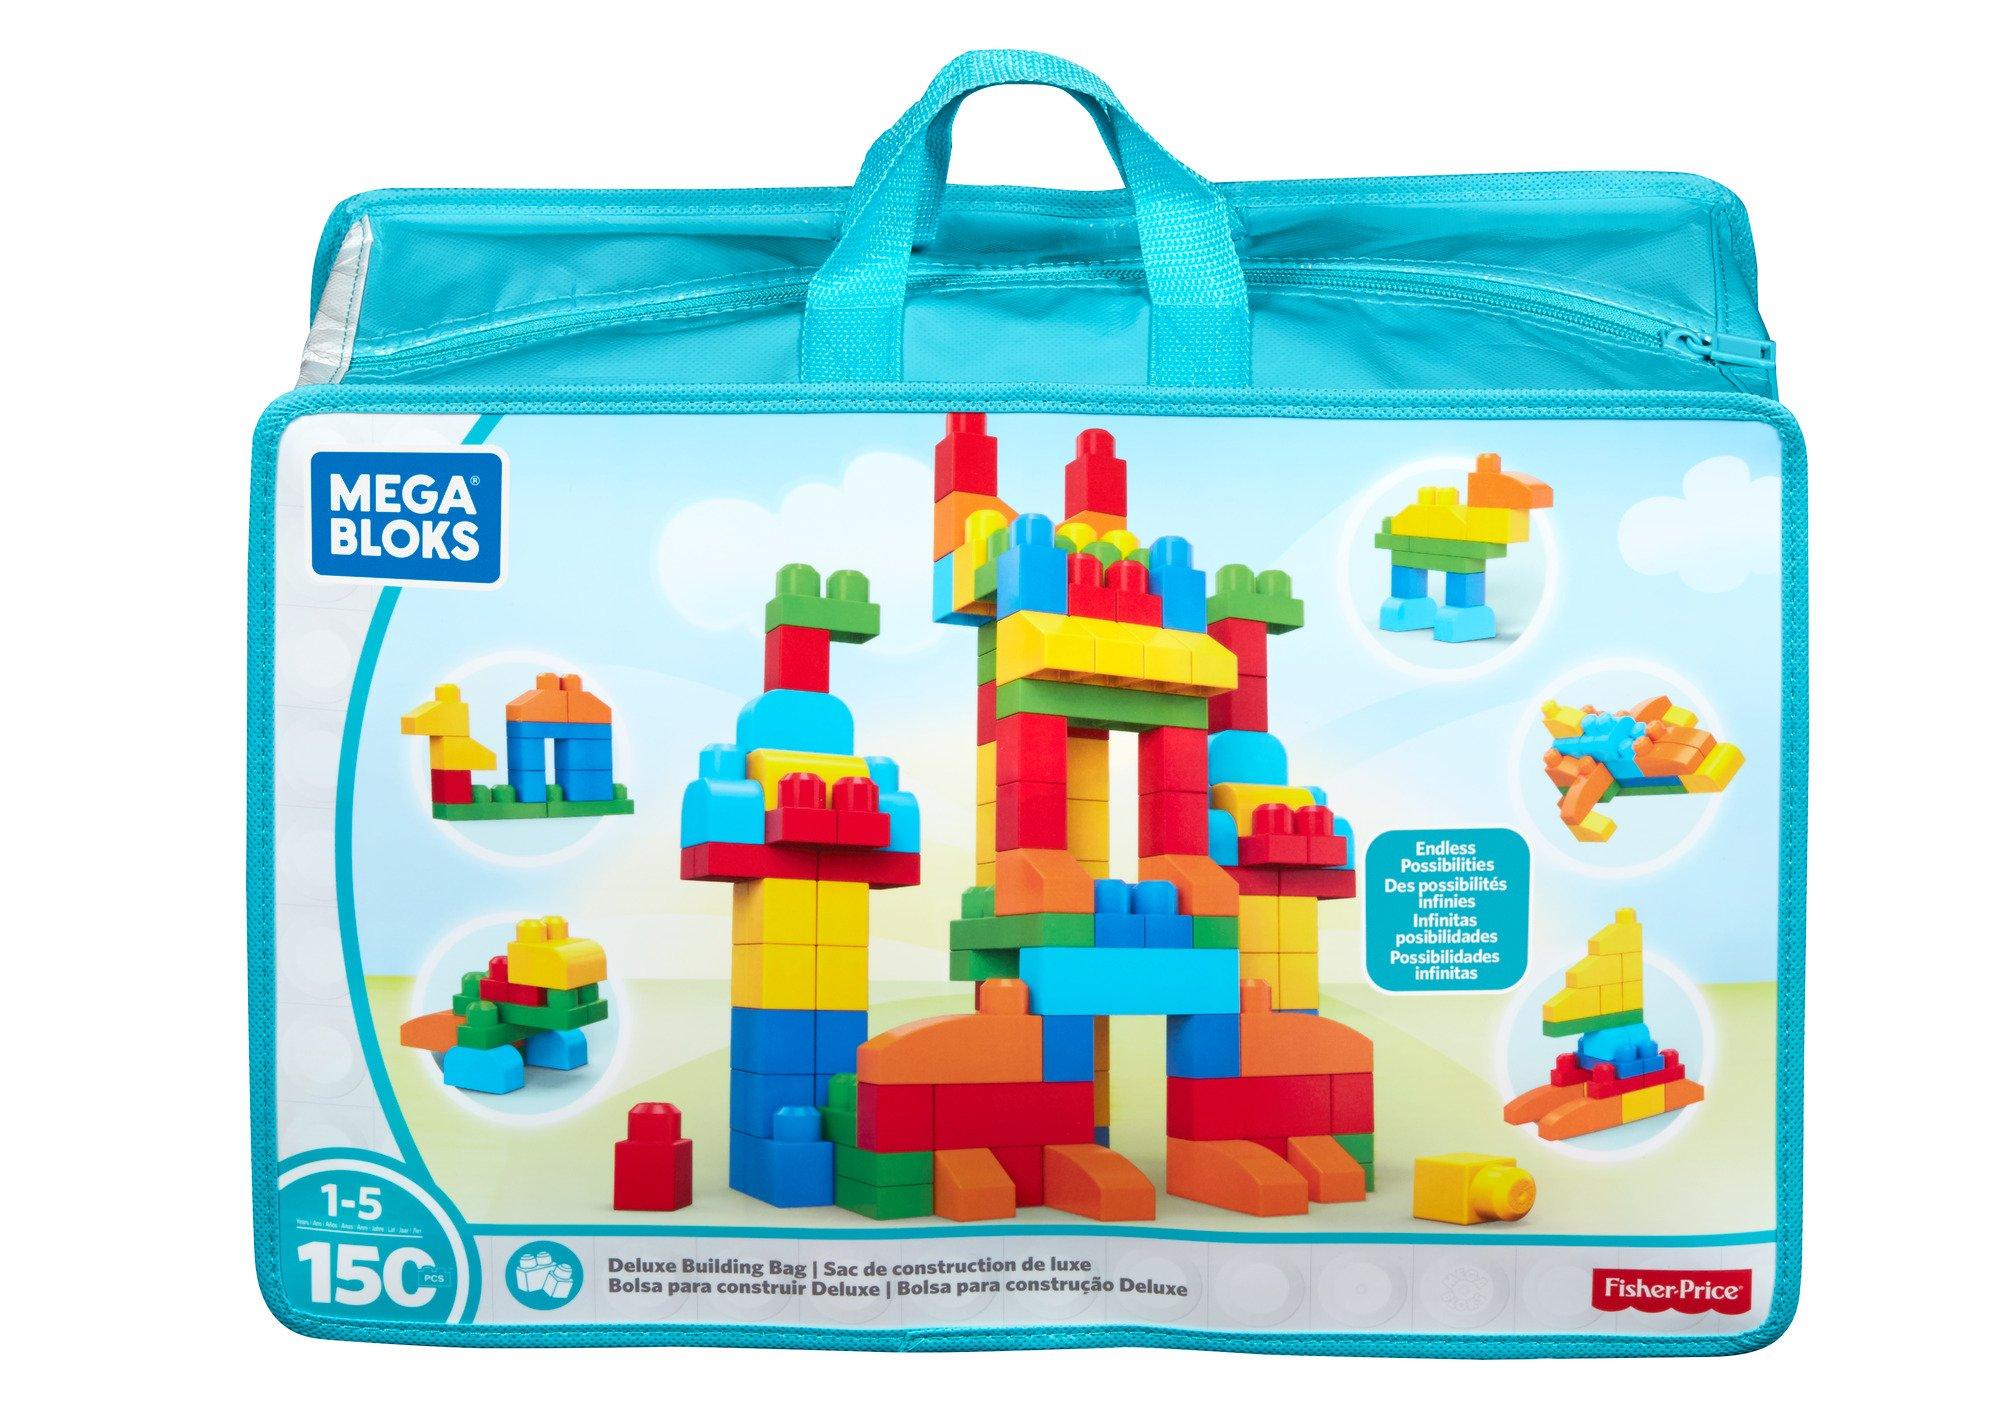 Mega Bloks Deluxe Building Bag 150-Piece